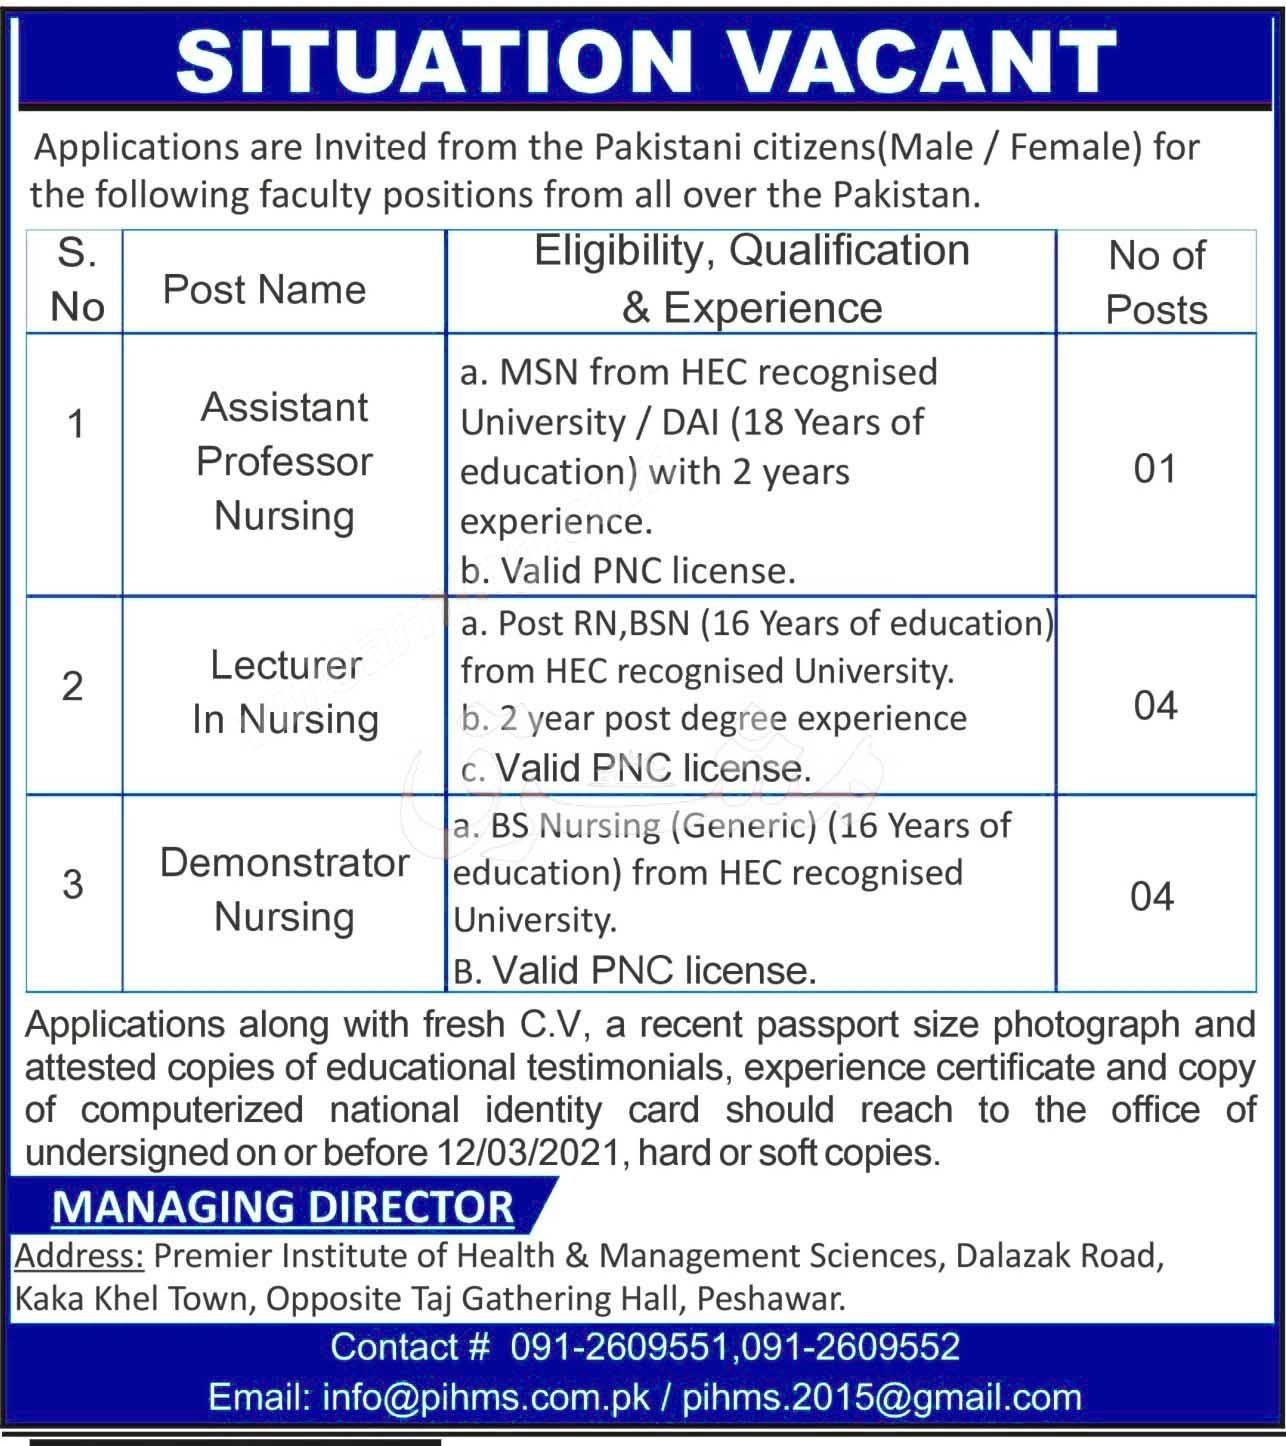 Premier Institute of Health & Management Sciences Peshawar Lecturers Demonstrators &